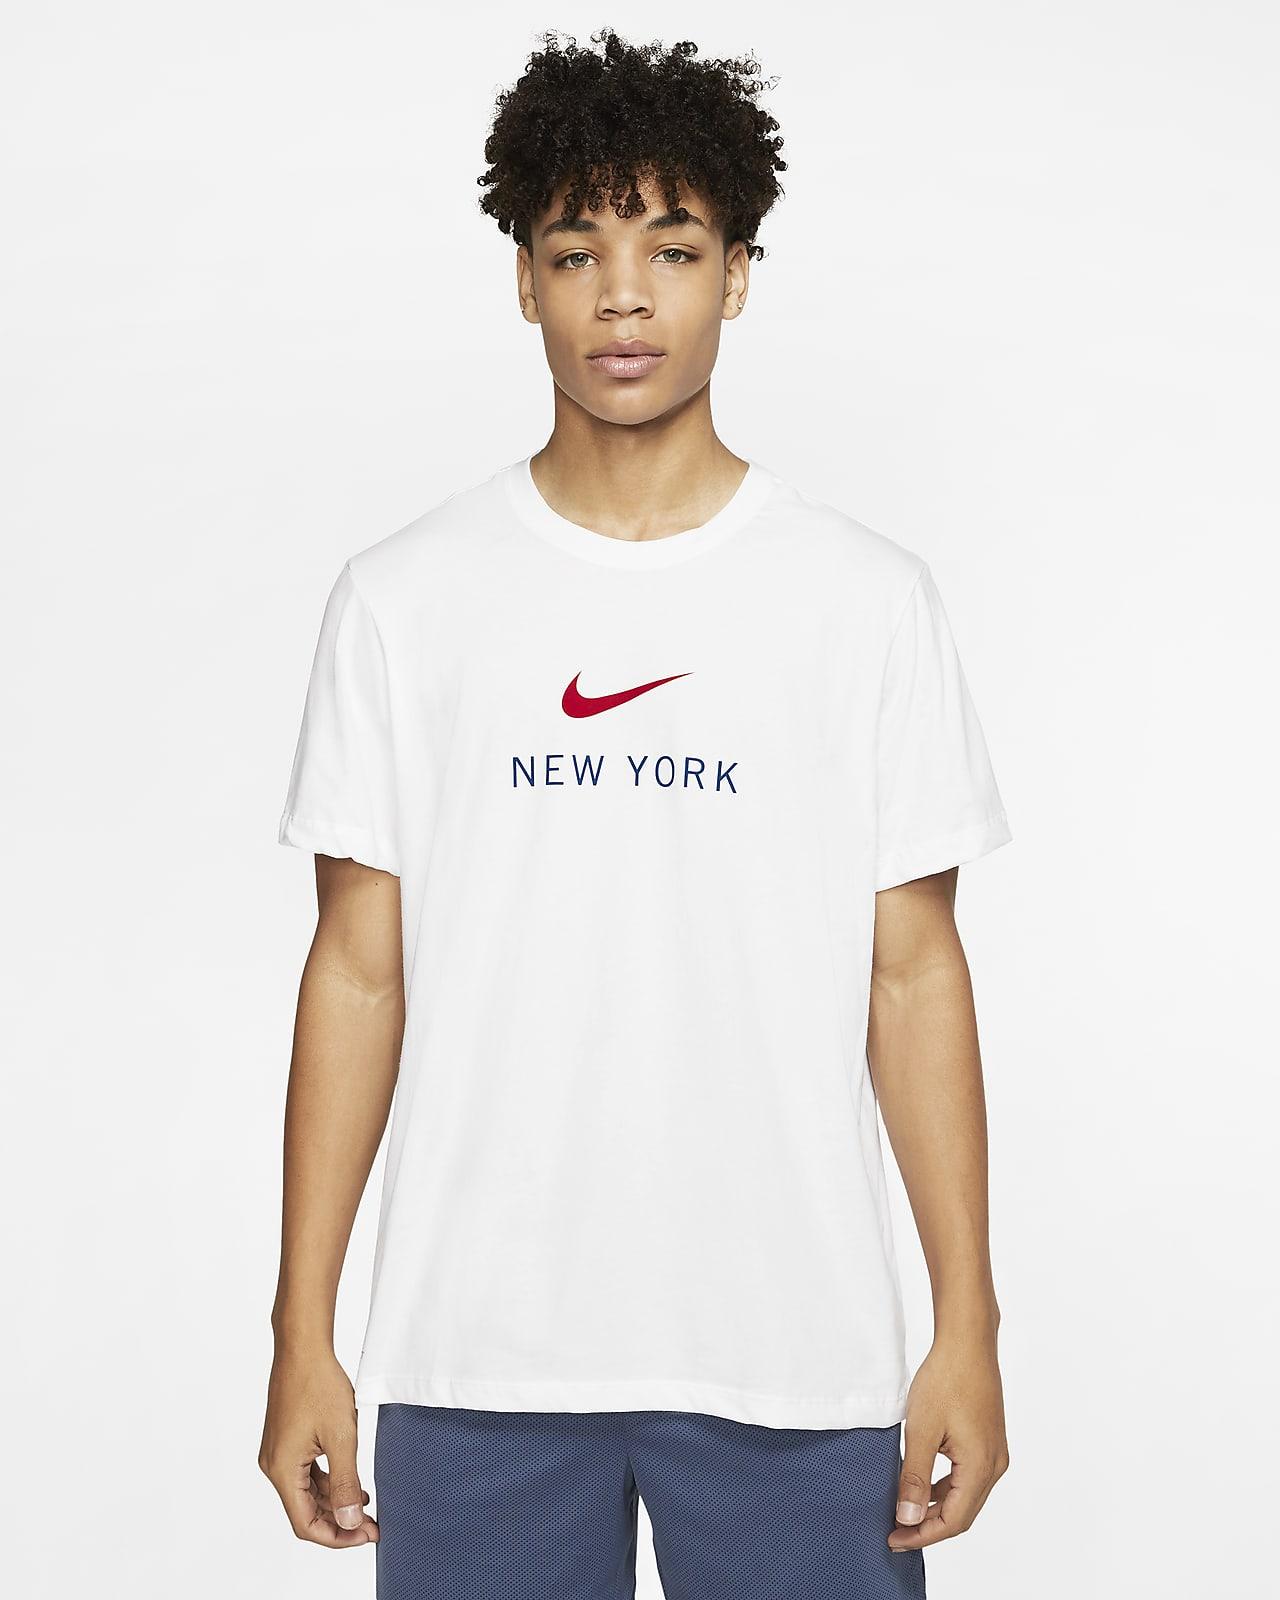 Nike Dri-FIT New York Men's Training T-Shirt